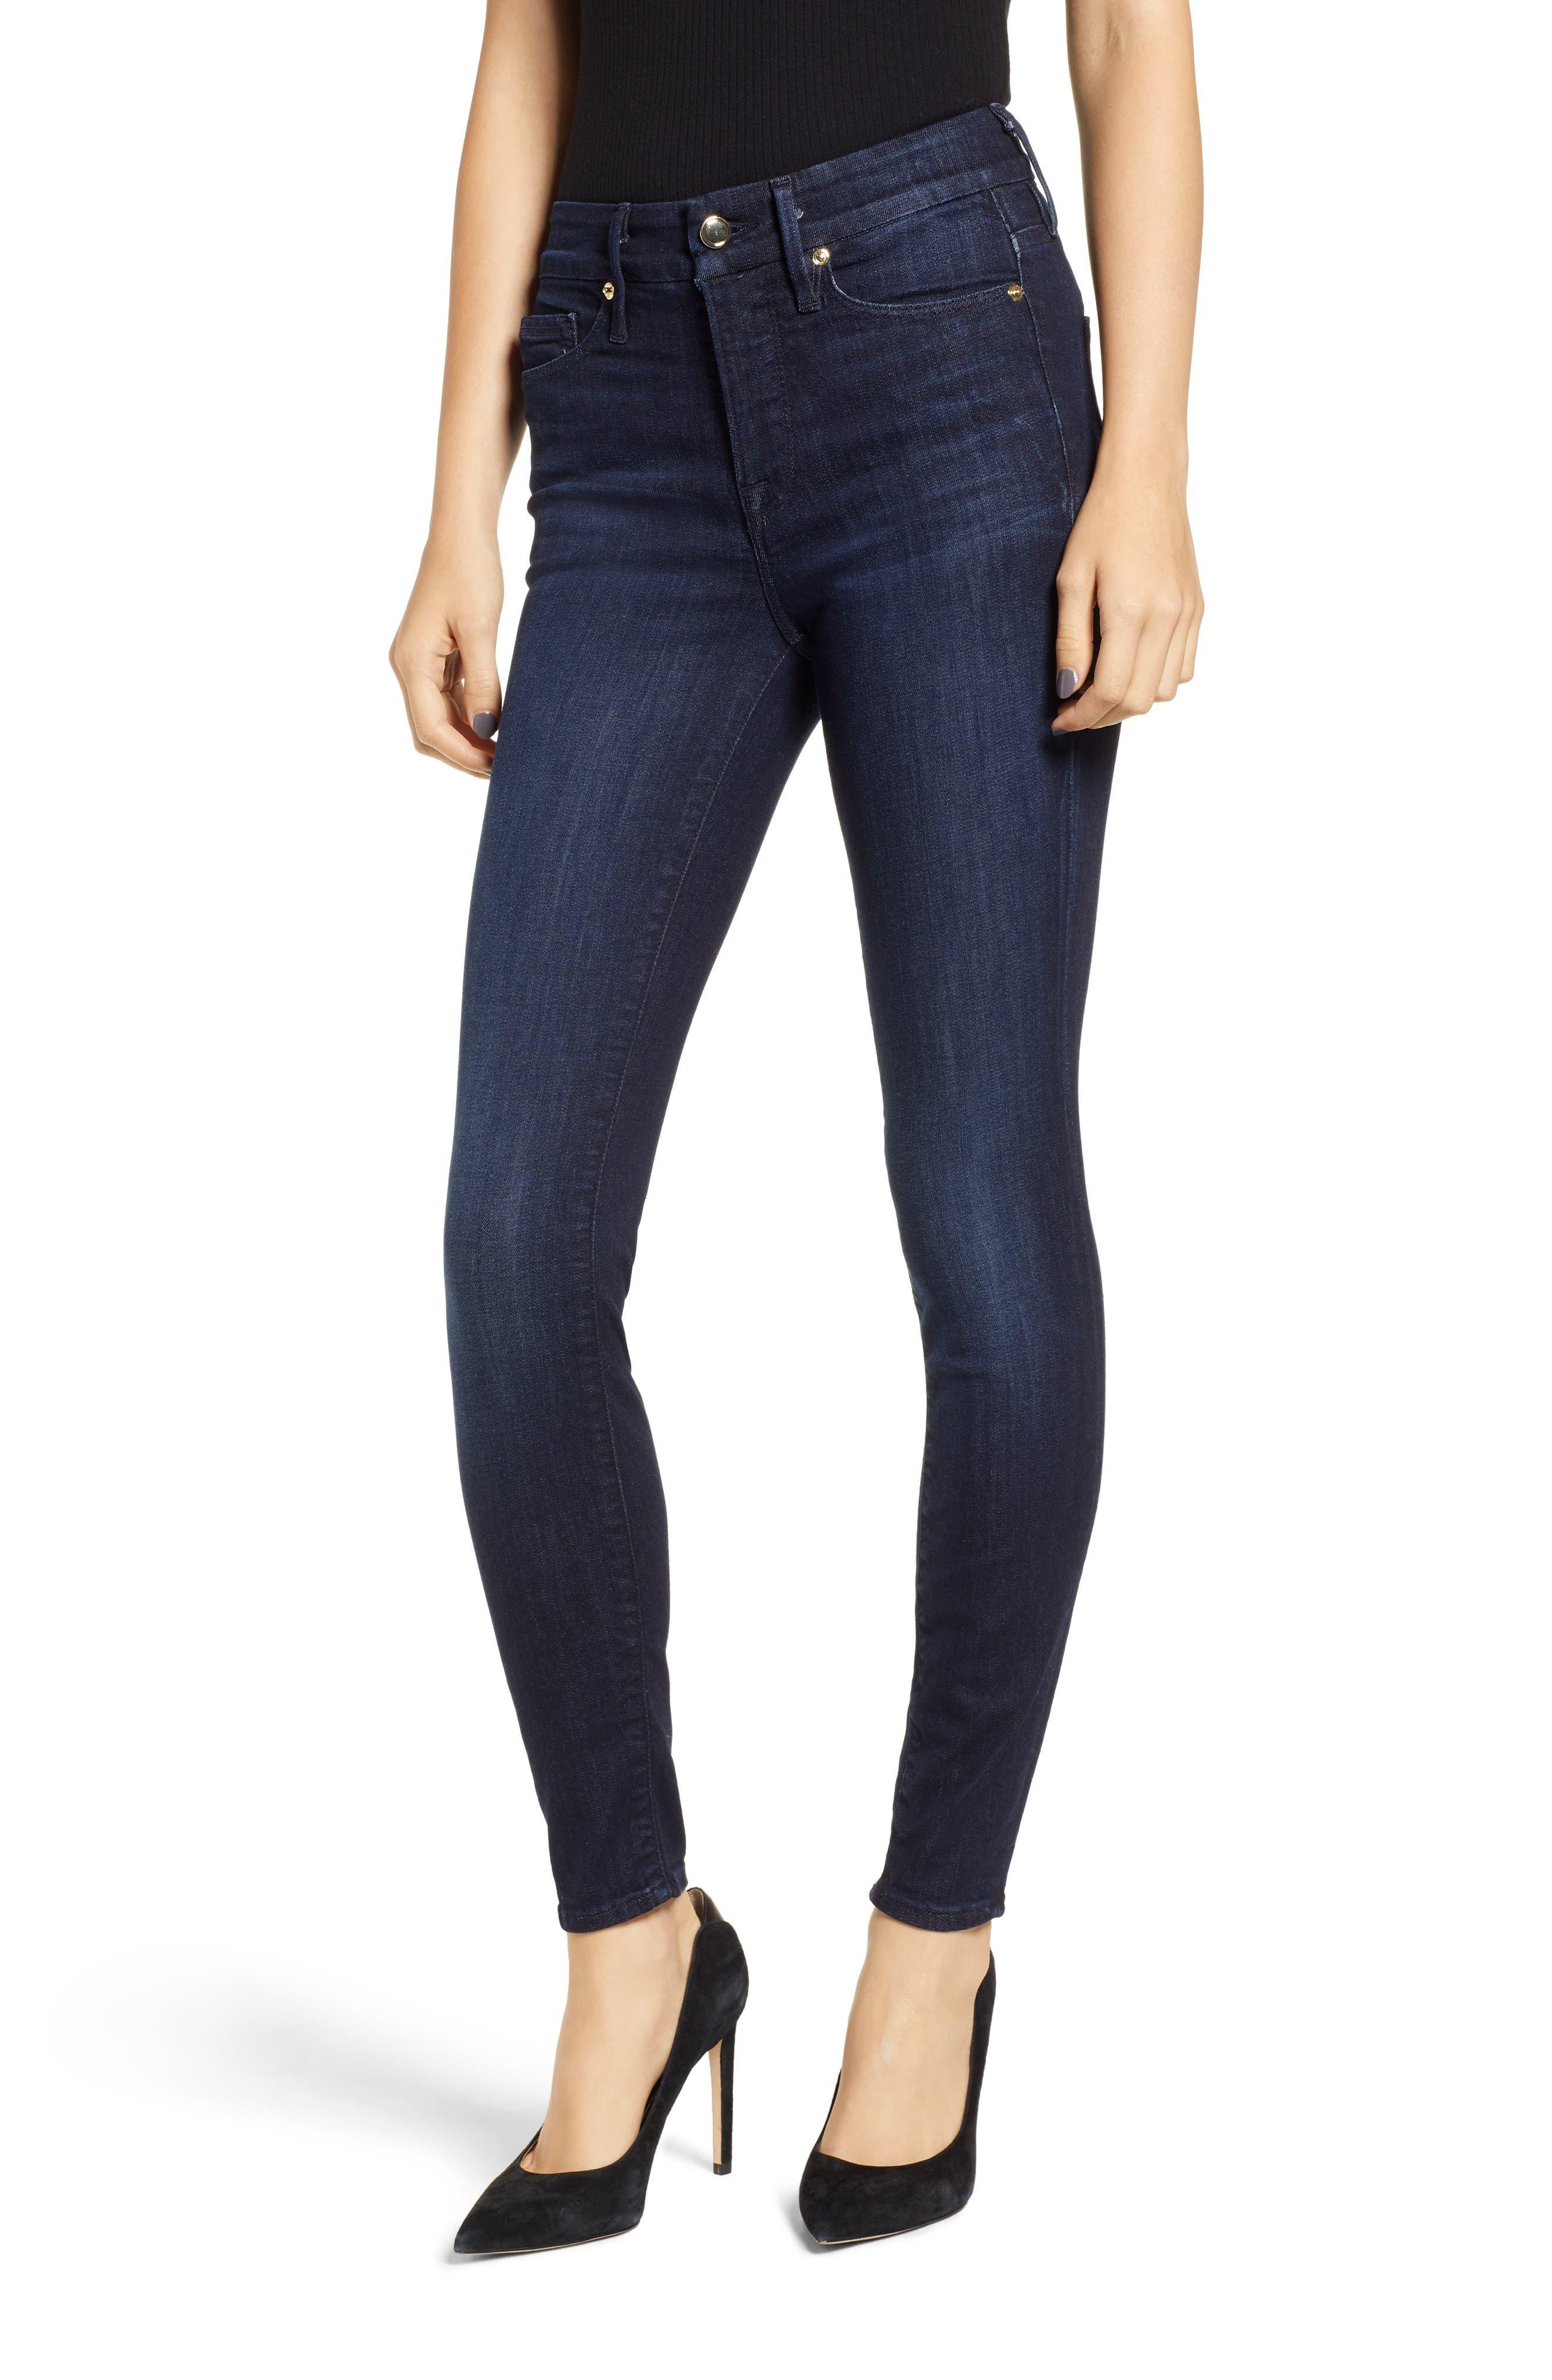 GOOD AMERICAN, Good Legs High Waist Skinny Jeans, Main thumbnail 1, color, BLUE224